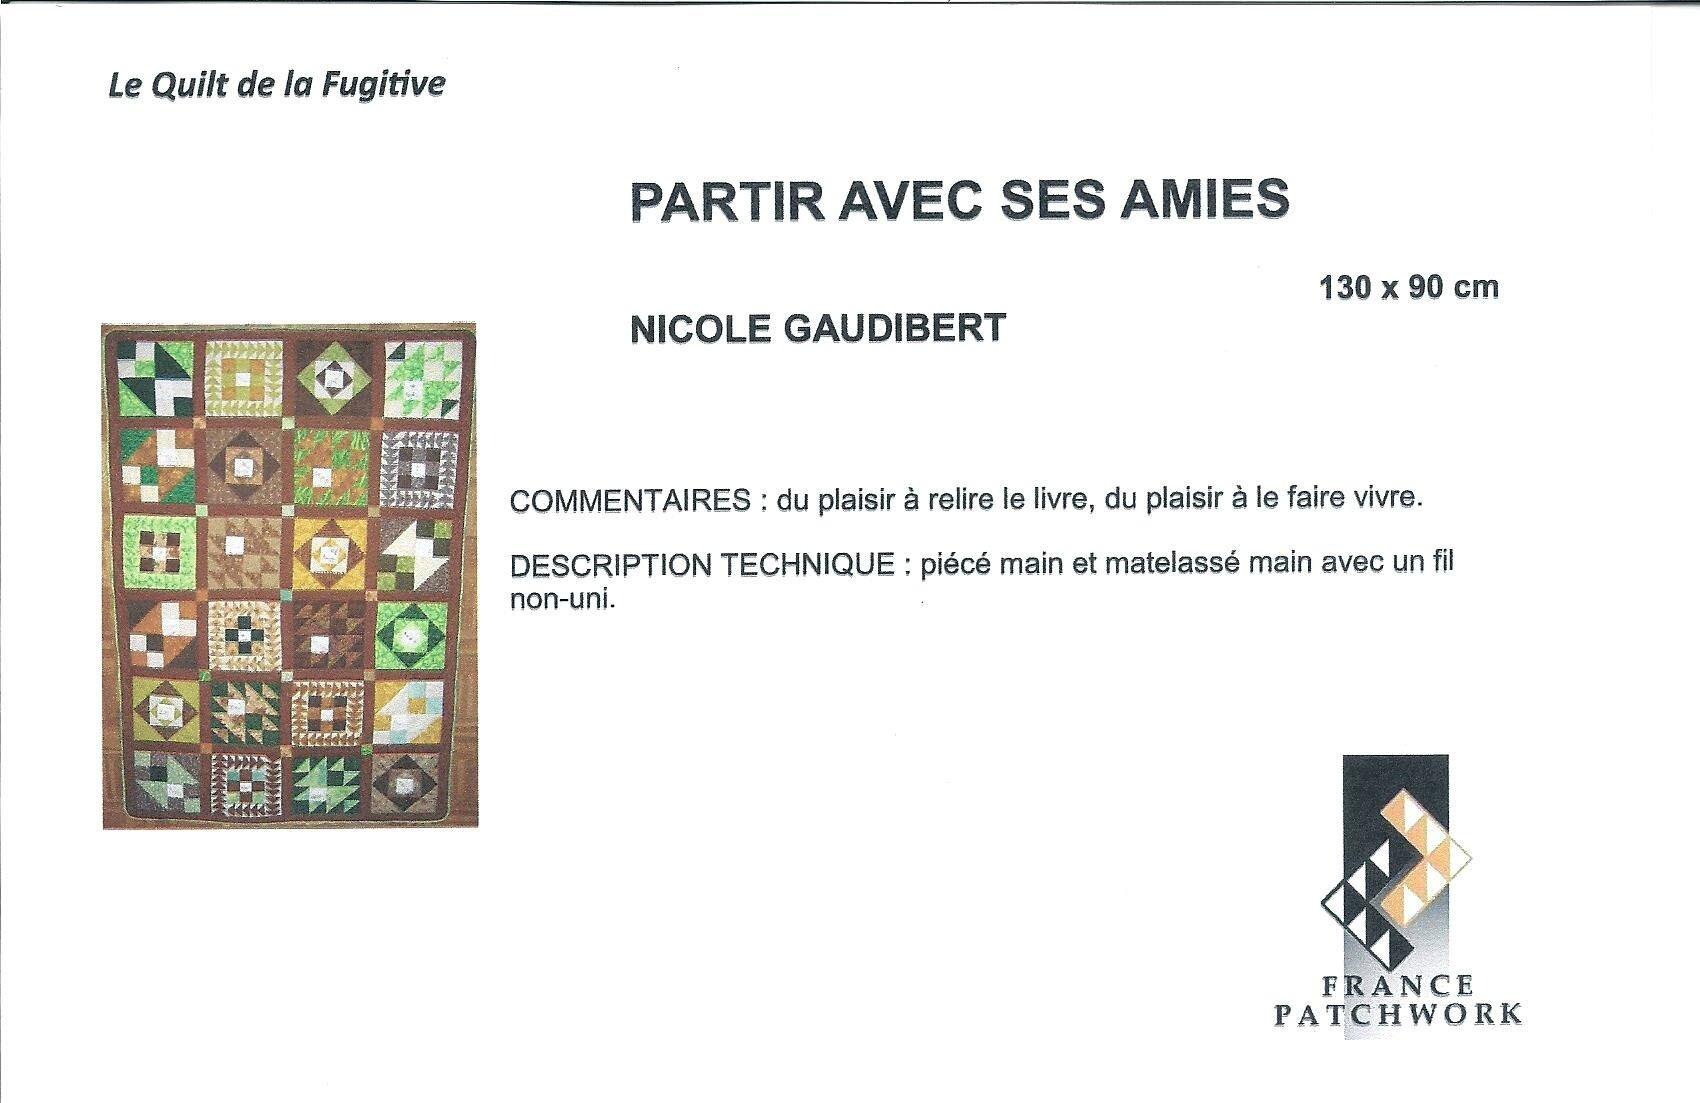 10_Nicole GAUDIBERT--PARTIR AVEC SES AMIS--Quilt La Fugitive10